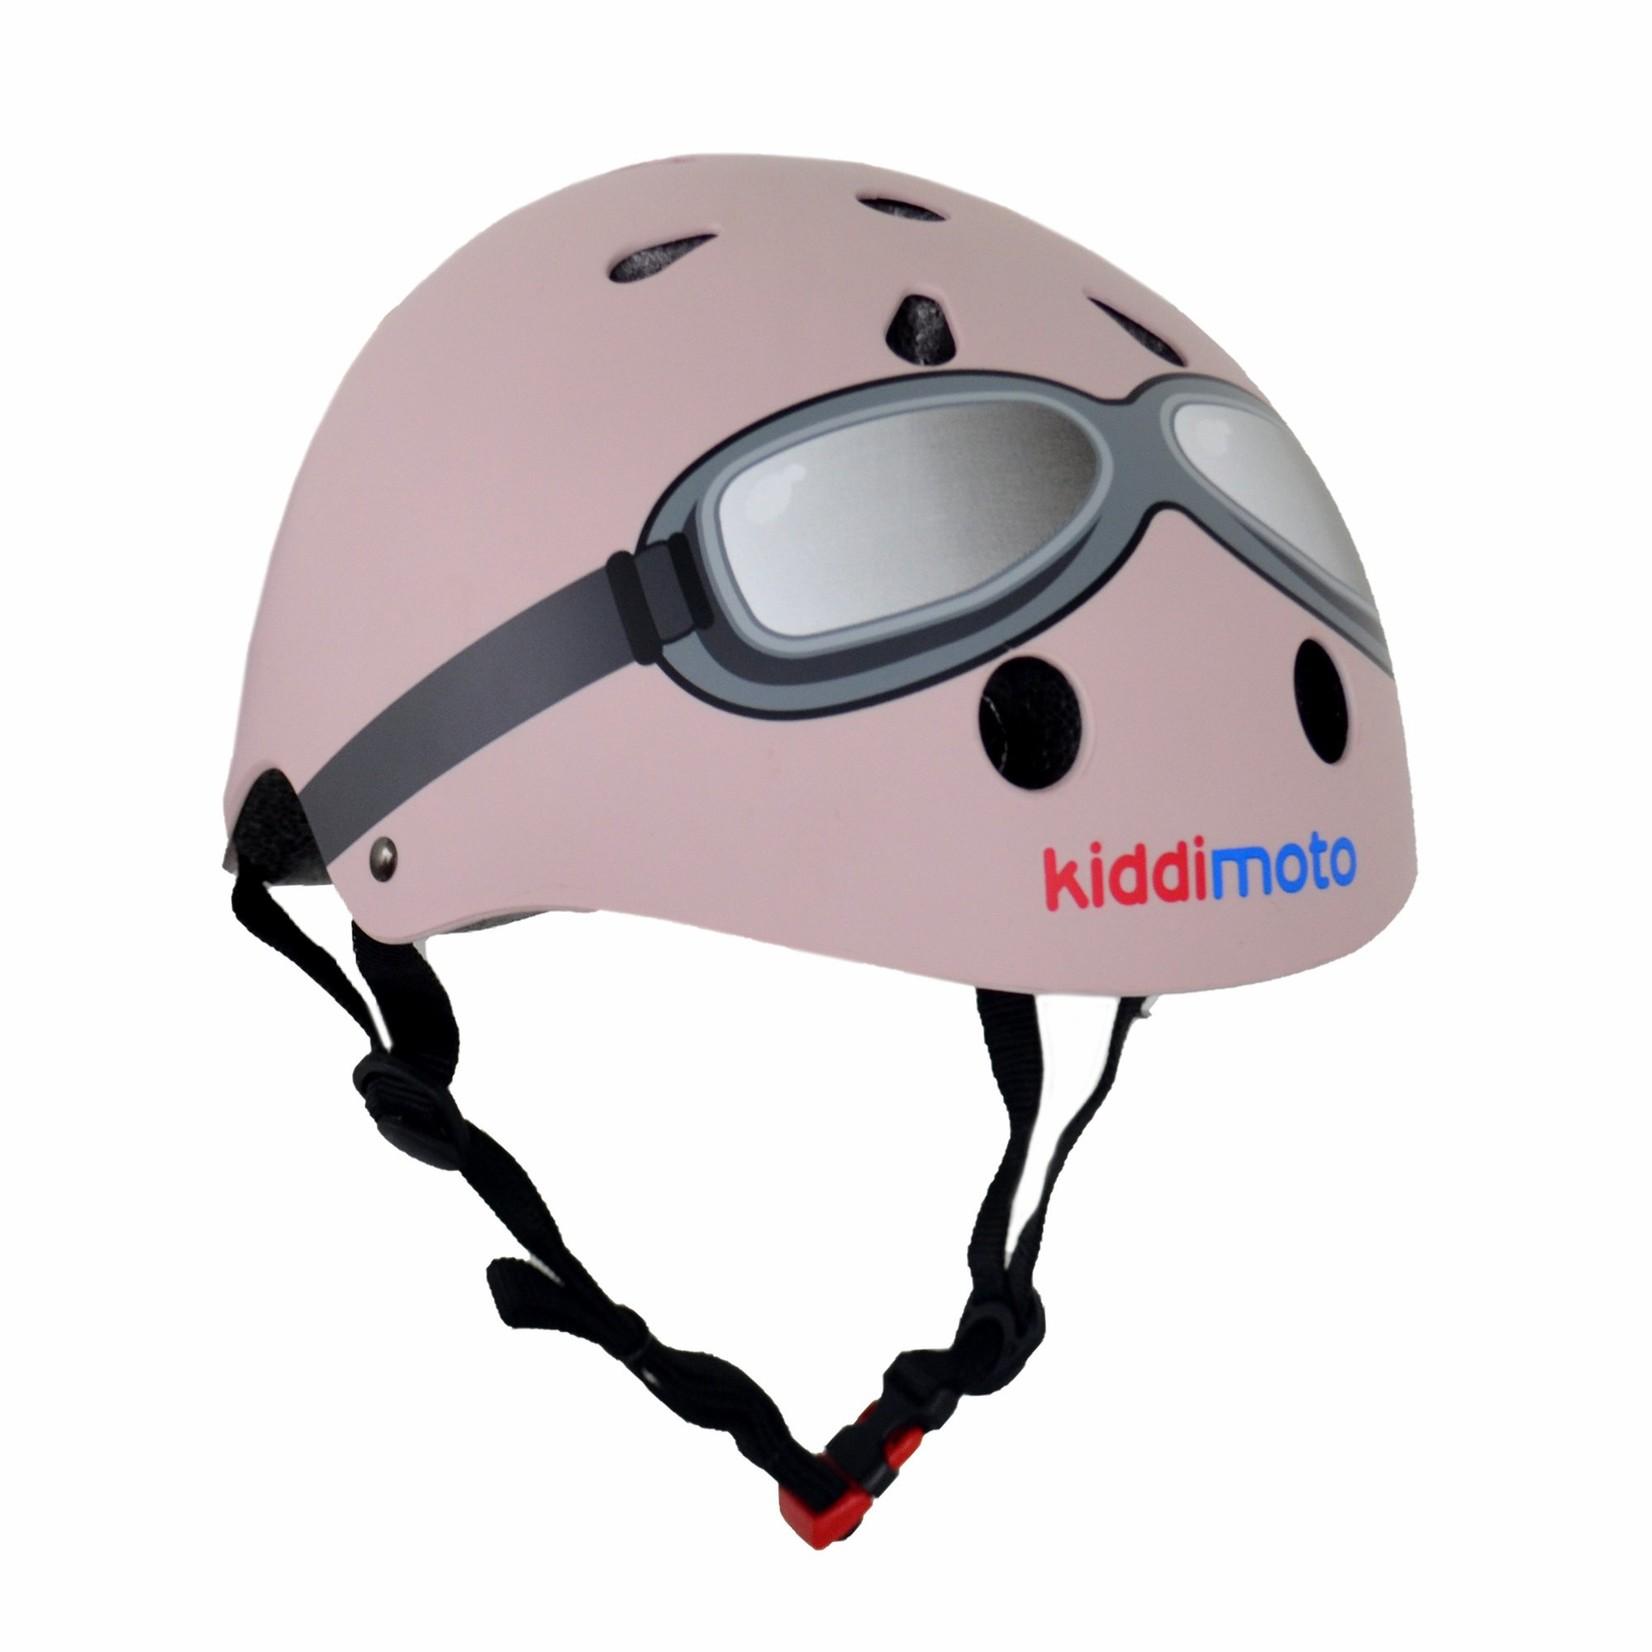 Kiddimoto Kiddimoto Kinderfietshelm Pastel Pink Goggle Small